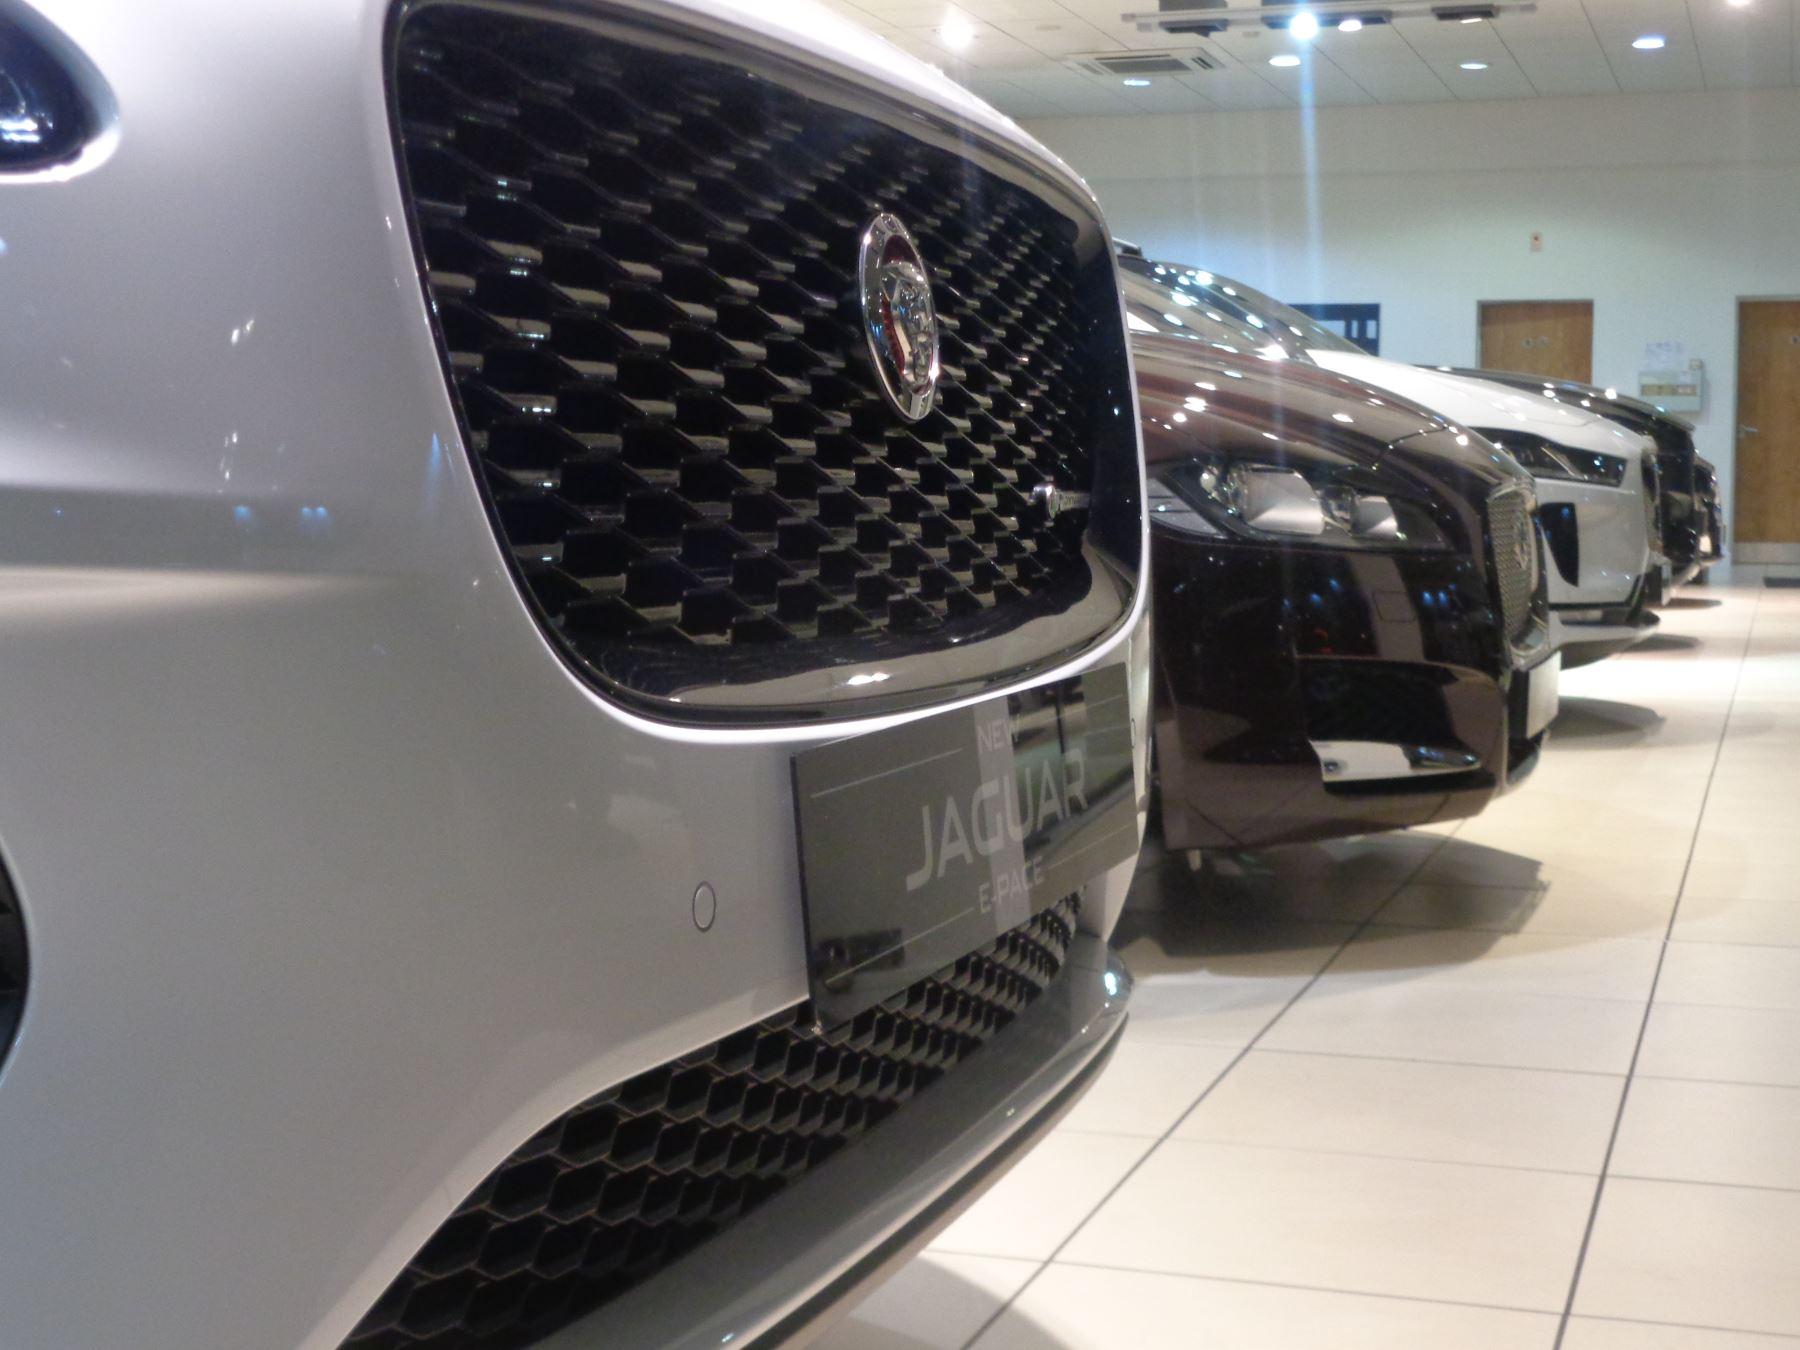 Jaguar  Essex Dealer Unbeatable Prices.Call now for yours!